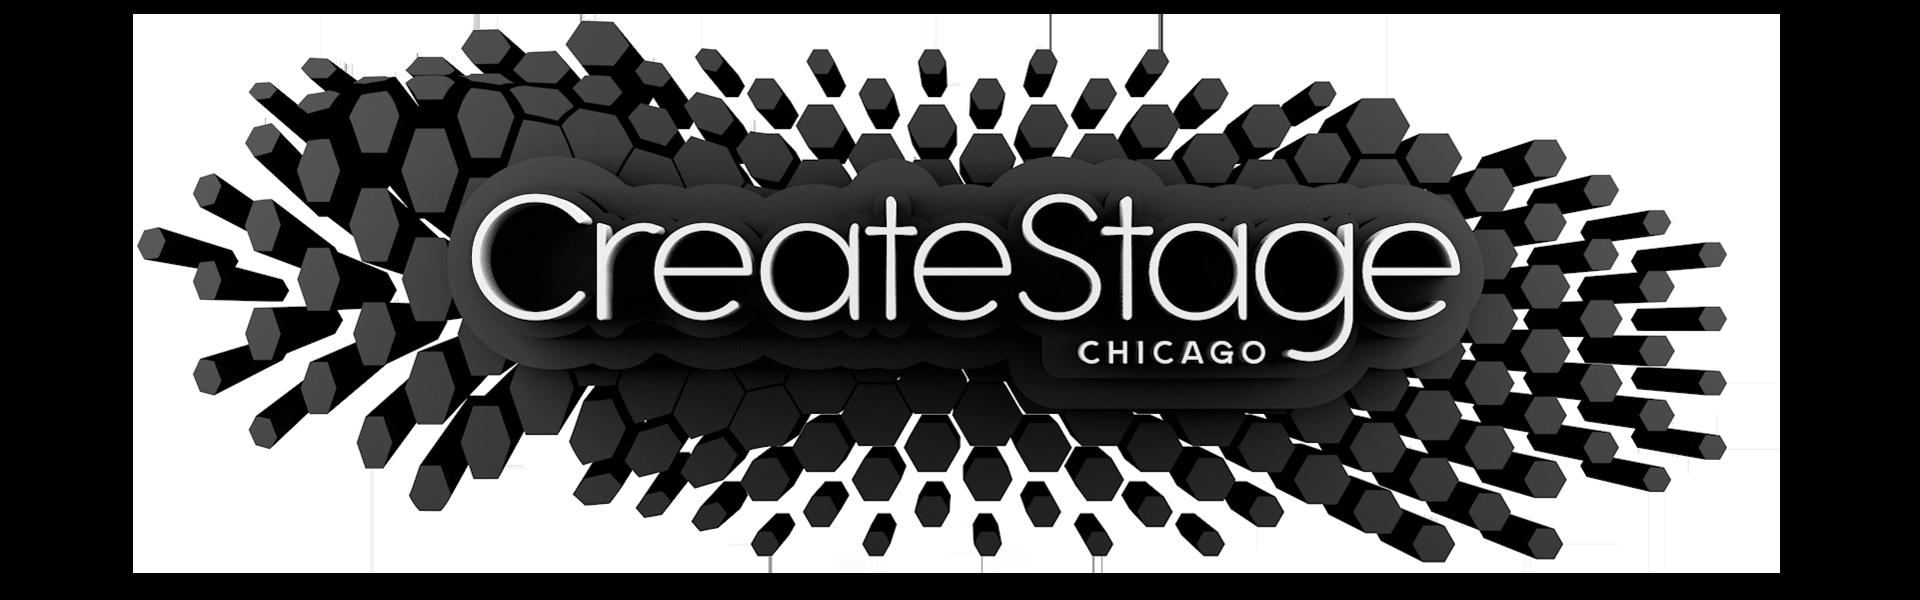 The ultimate alpha. The CreateStage logo alpha image.